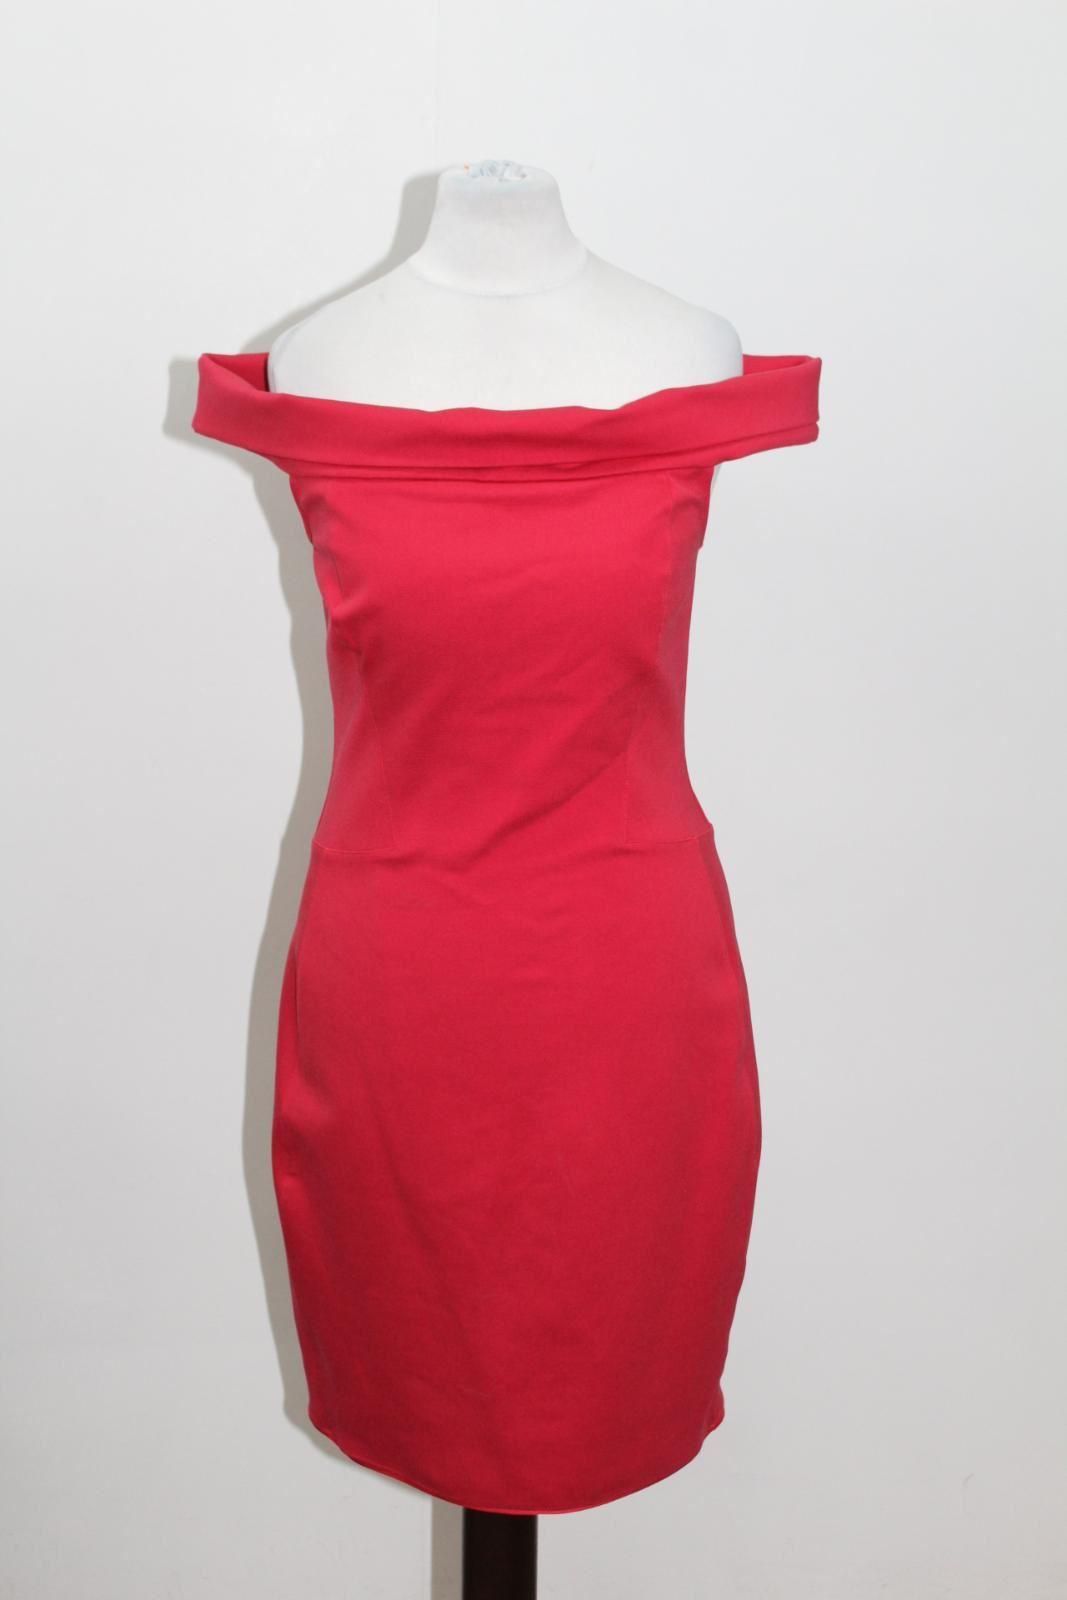 HALSTON HERITAGE Ladies rot Off The Shoulder Bardot Neck Pencil Dress US6 UK10